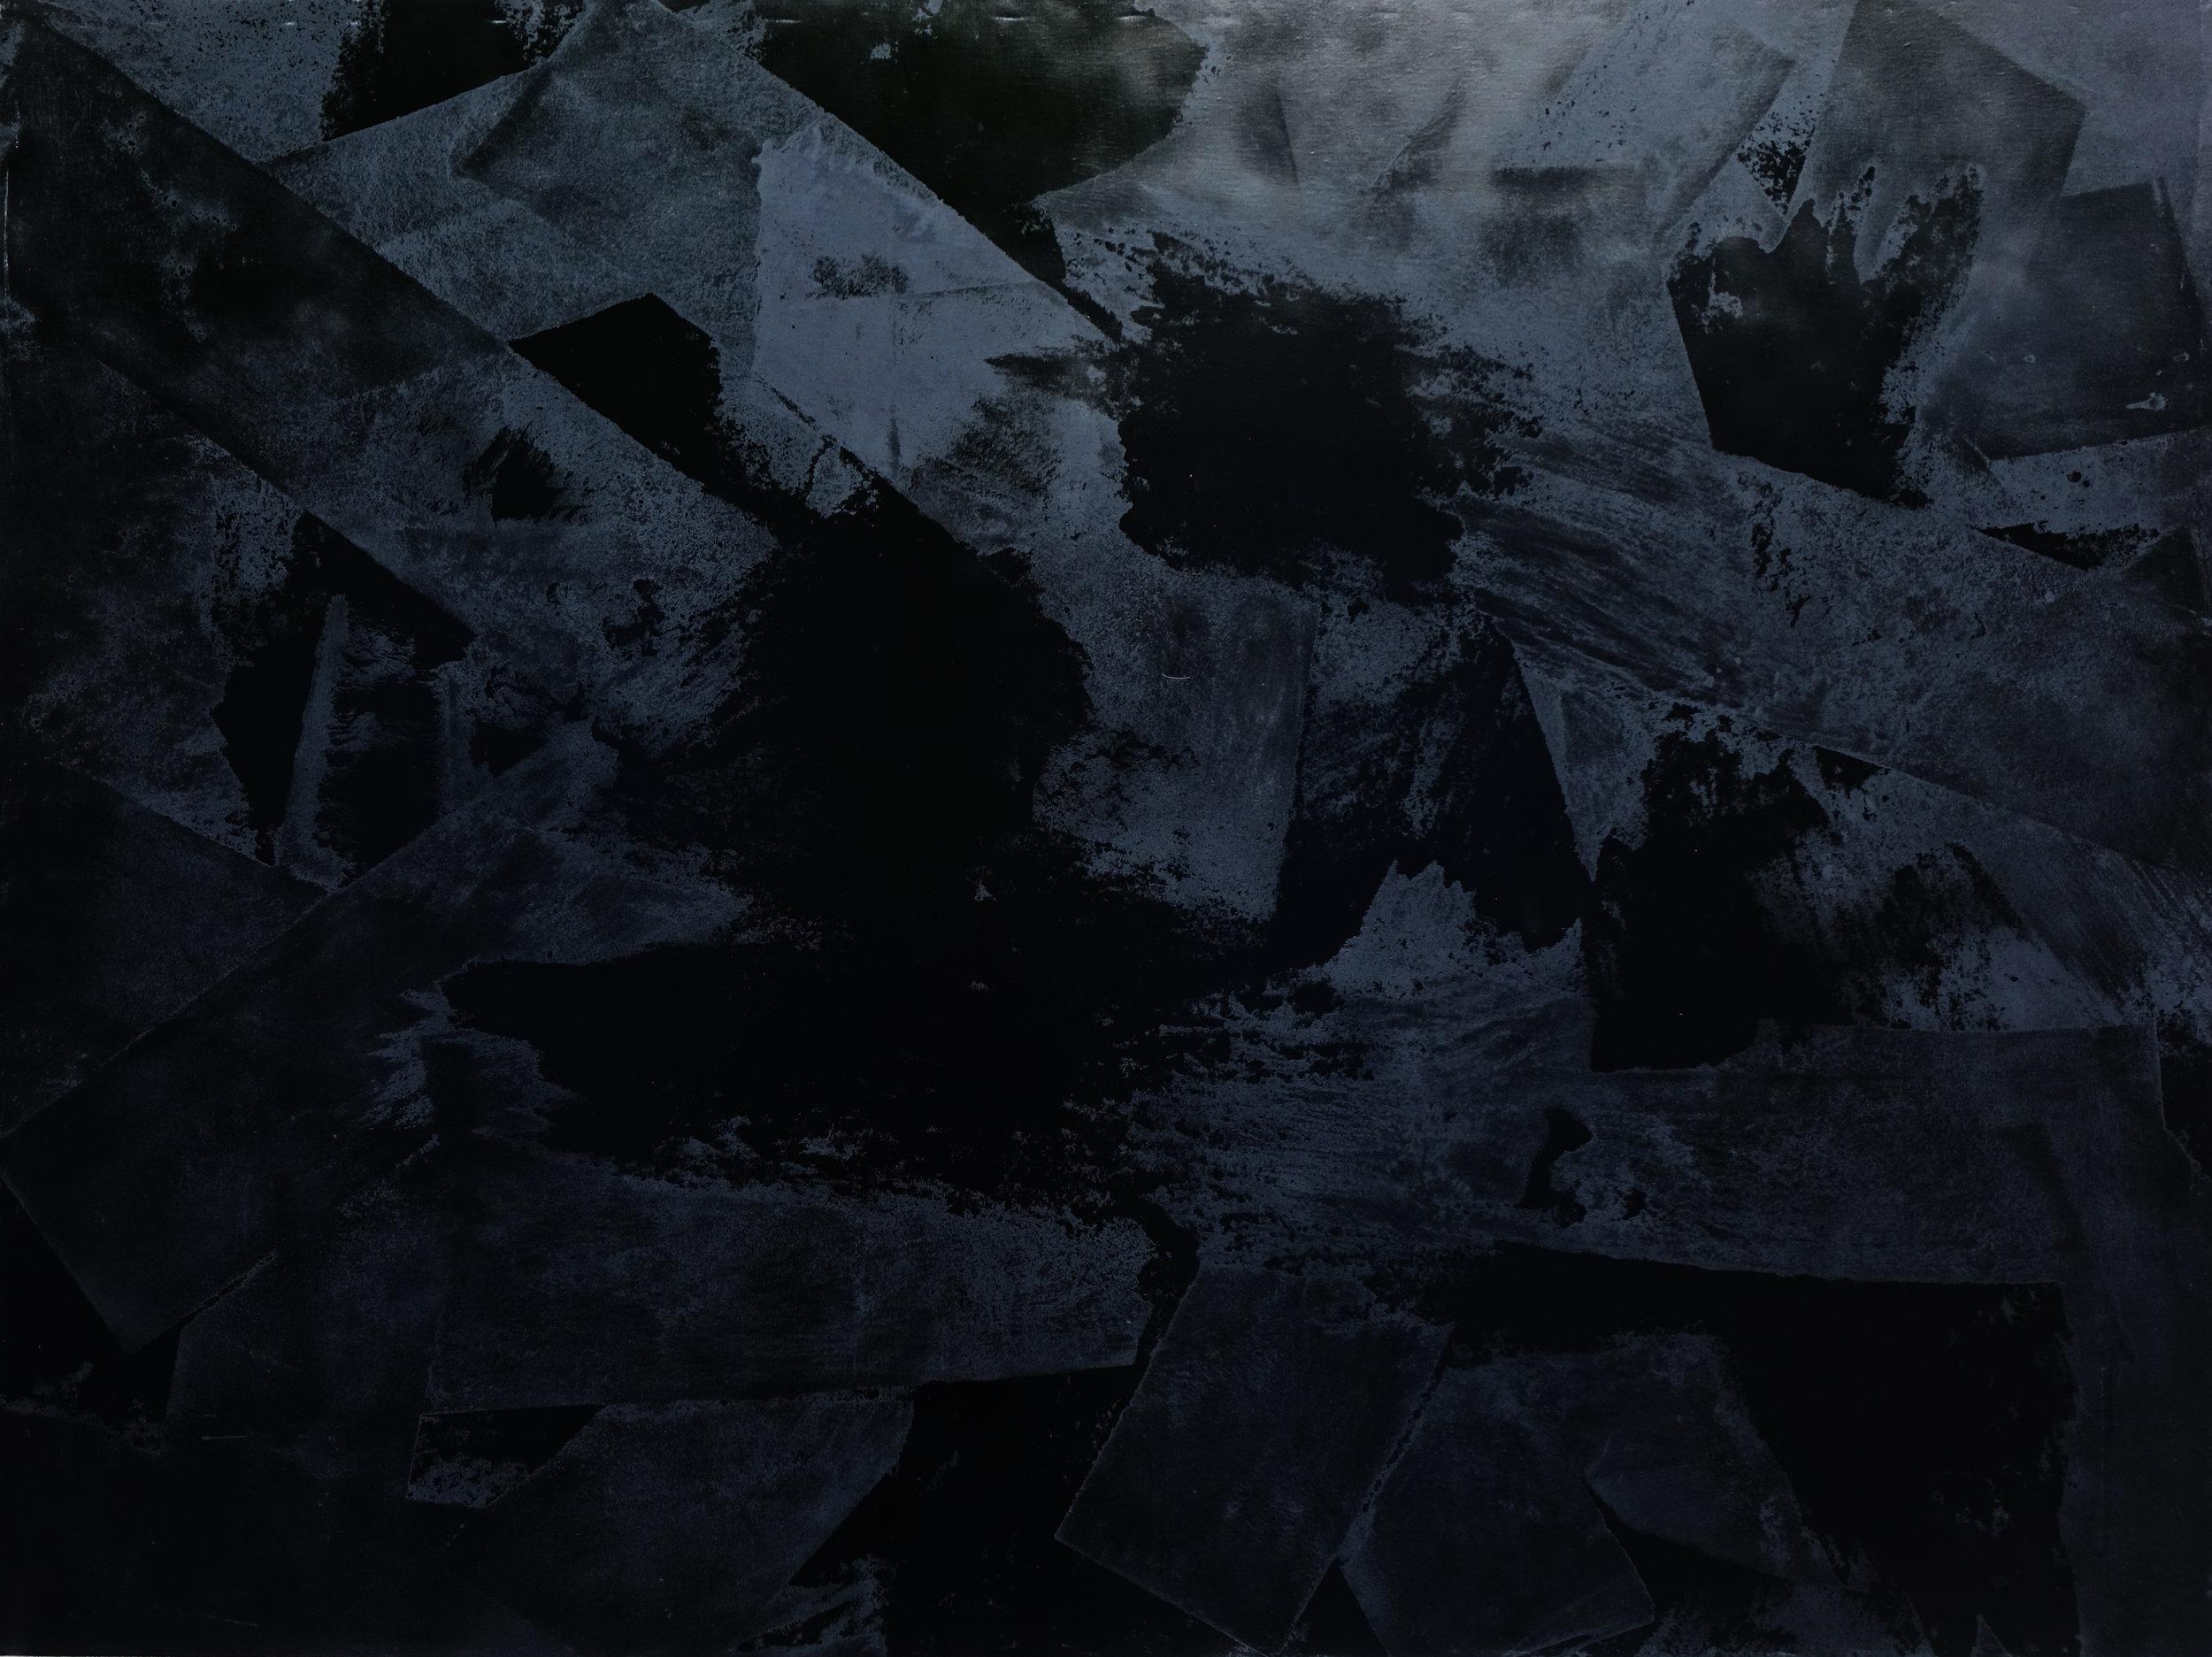 Black Void No. 18, 2017, 259cm x 194cm 200F, Oil on Canvas.jpg